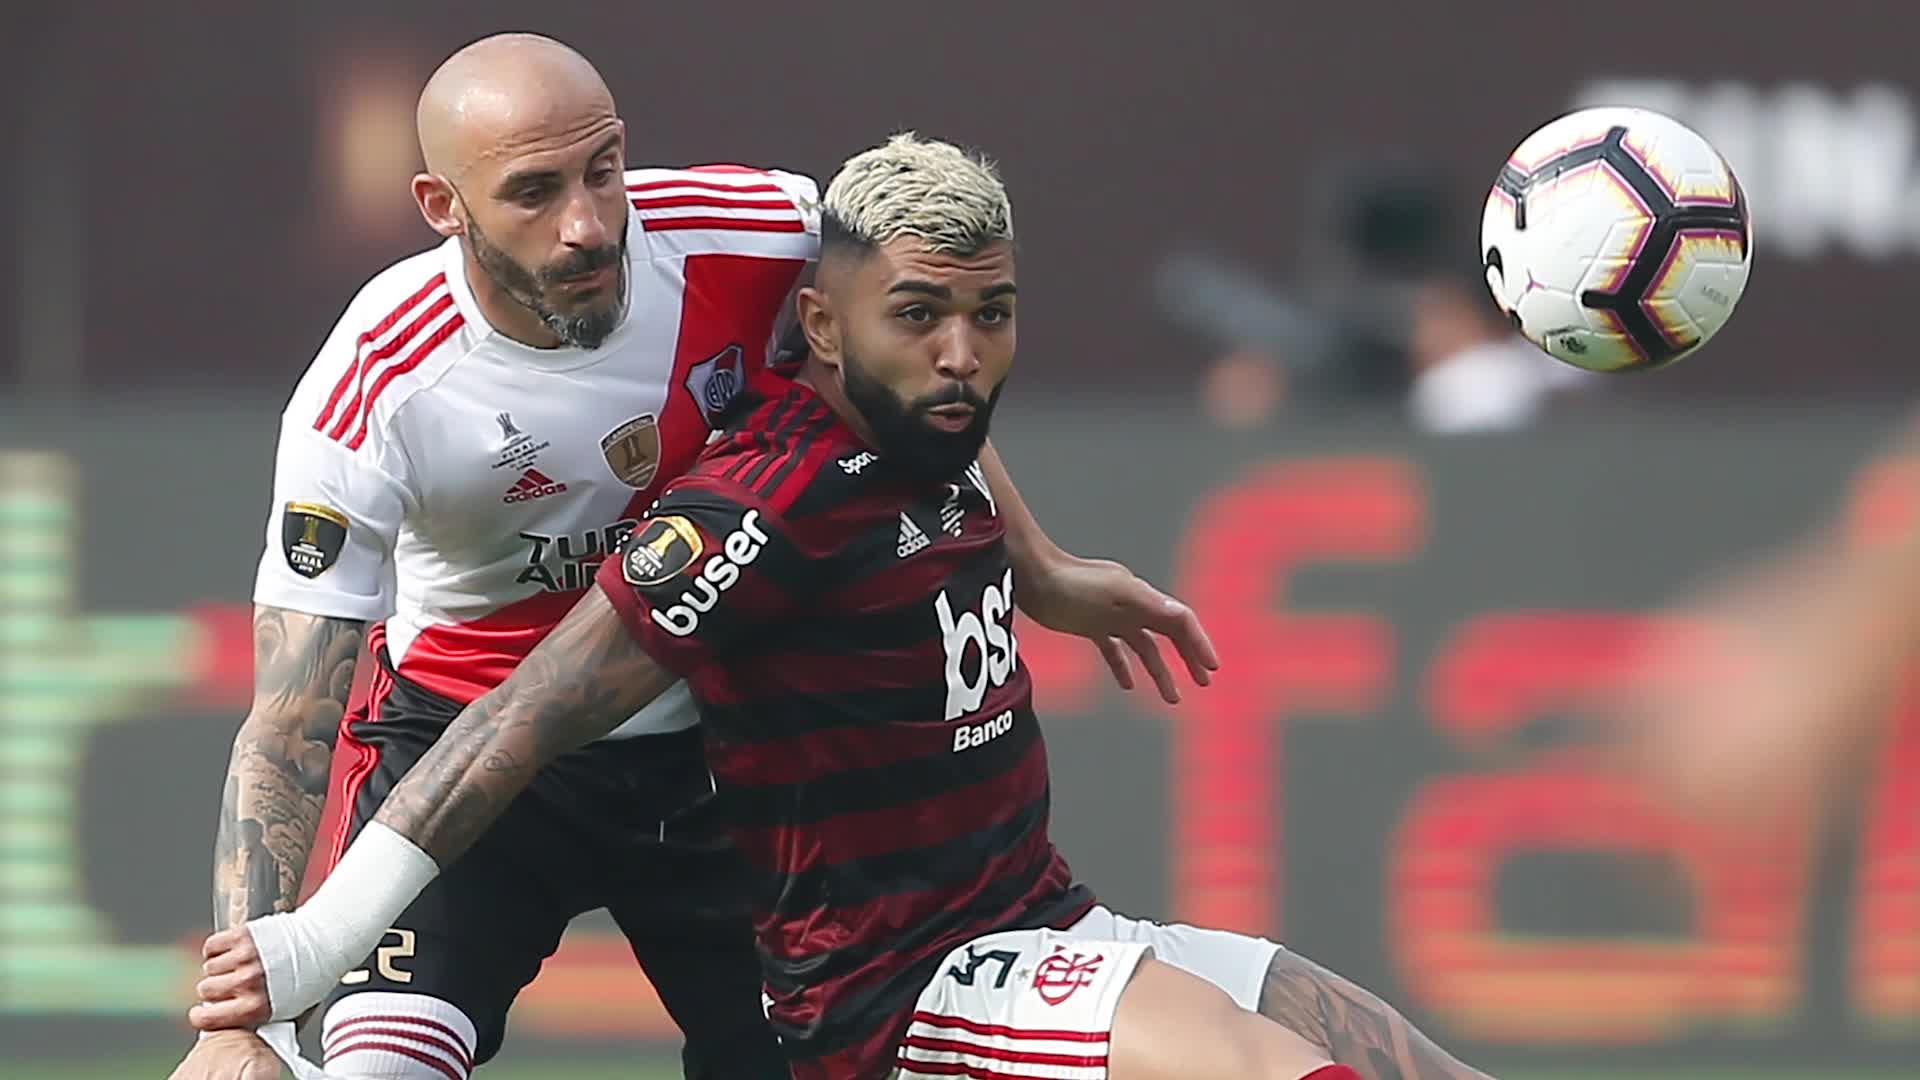 Copa Libertadores 2019: 'Gabigol' anotó el agónico empate tras gran jugada individual de Bruno Henrique